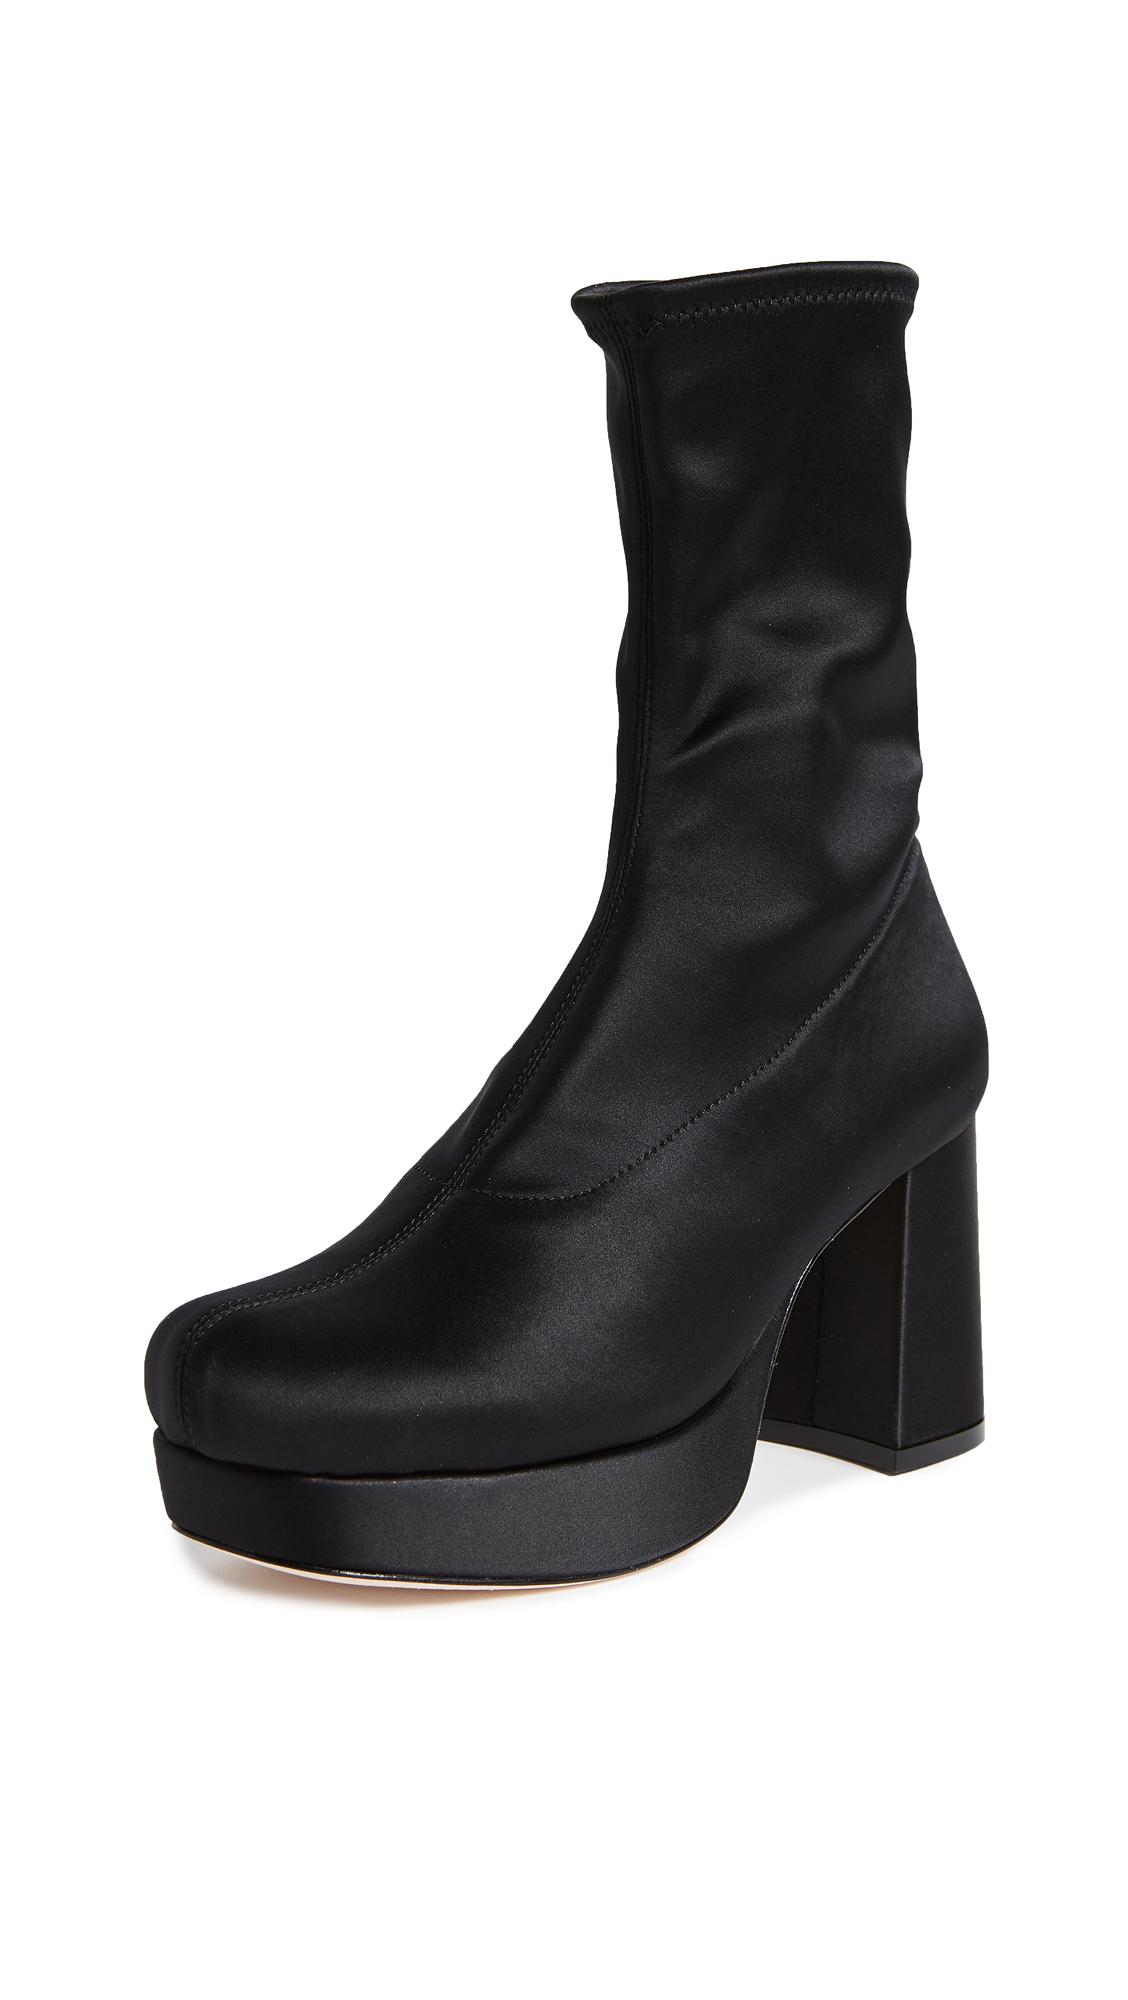 Isa Tapia Brooke Platform Boots - Black